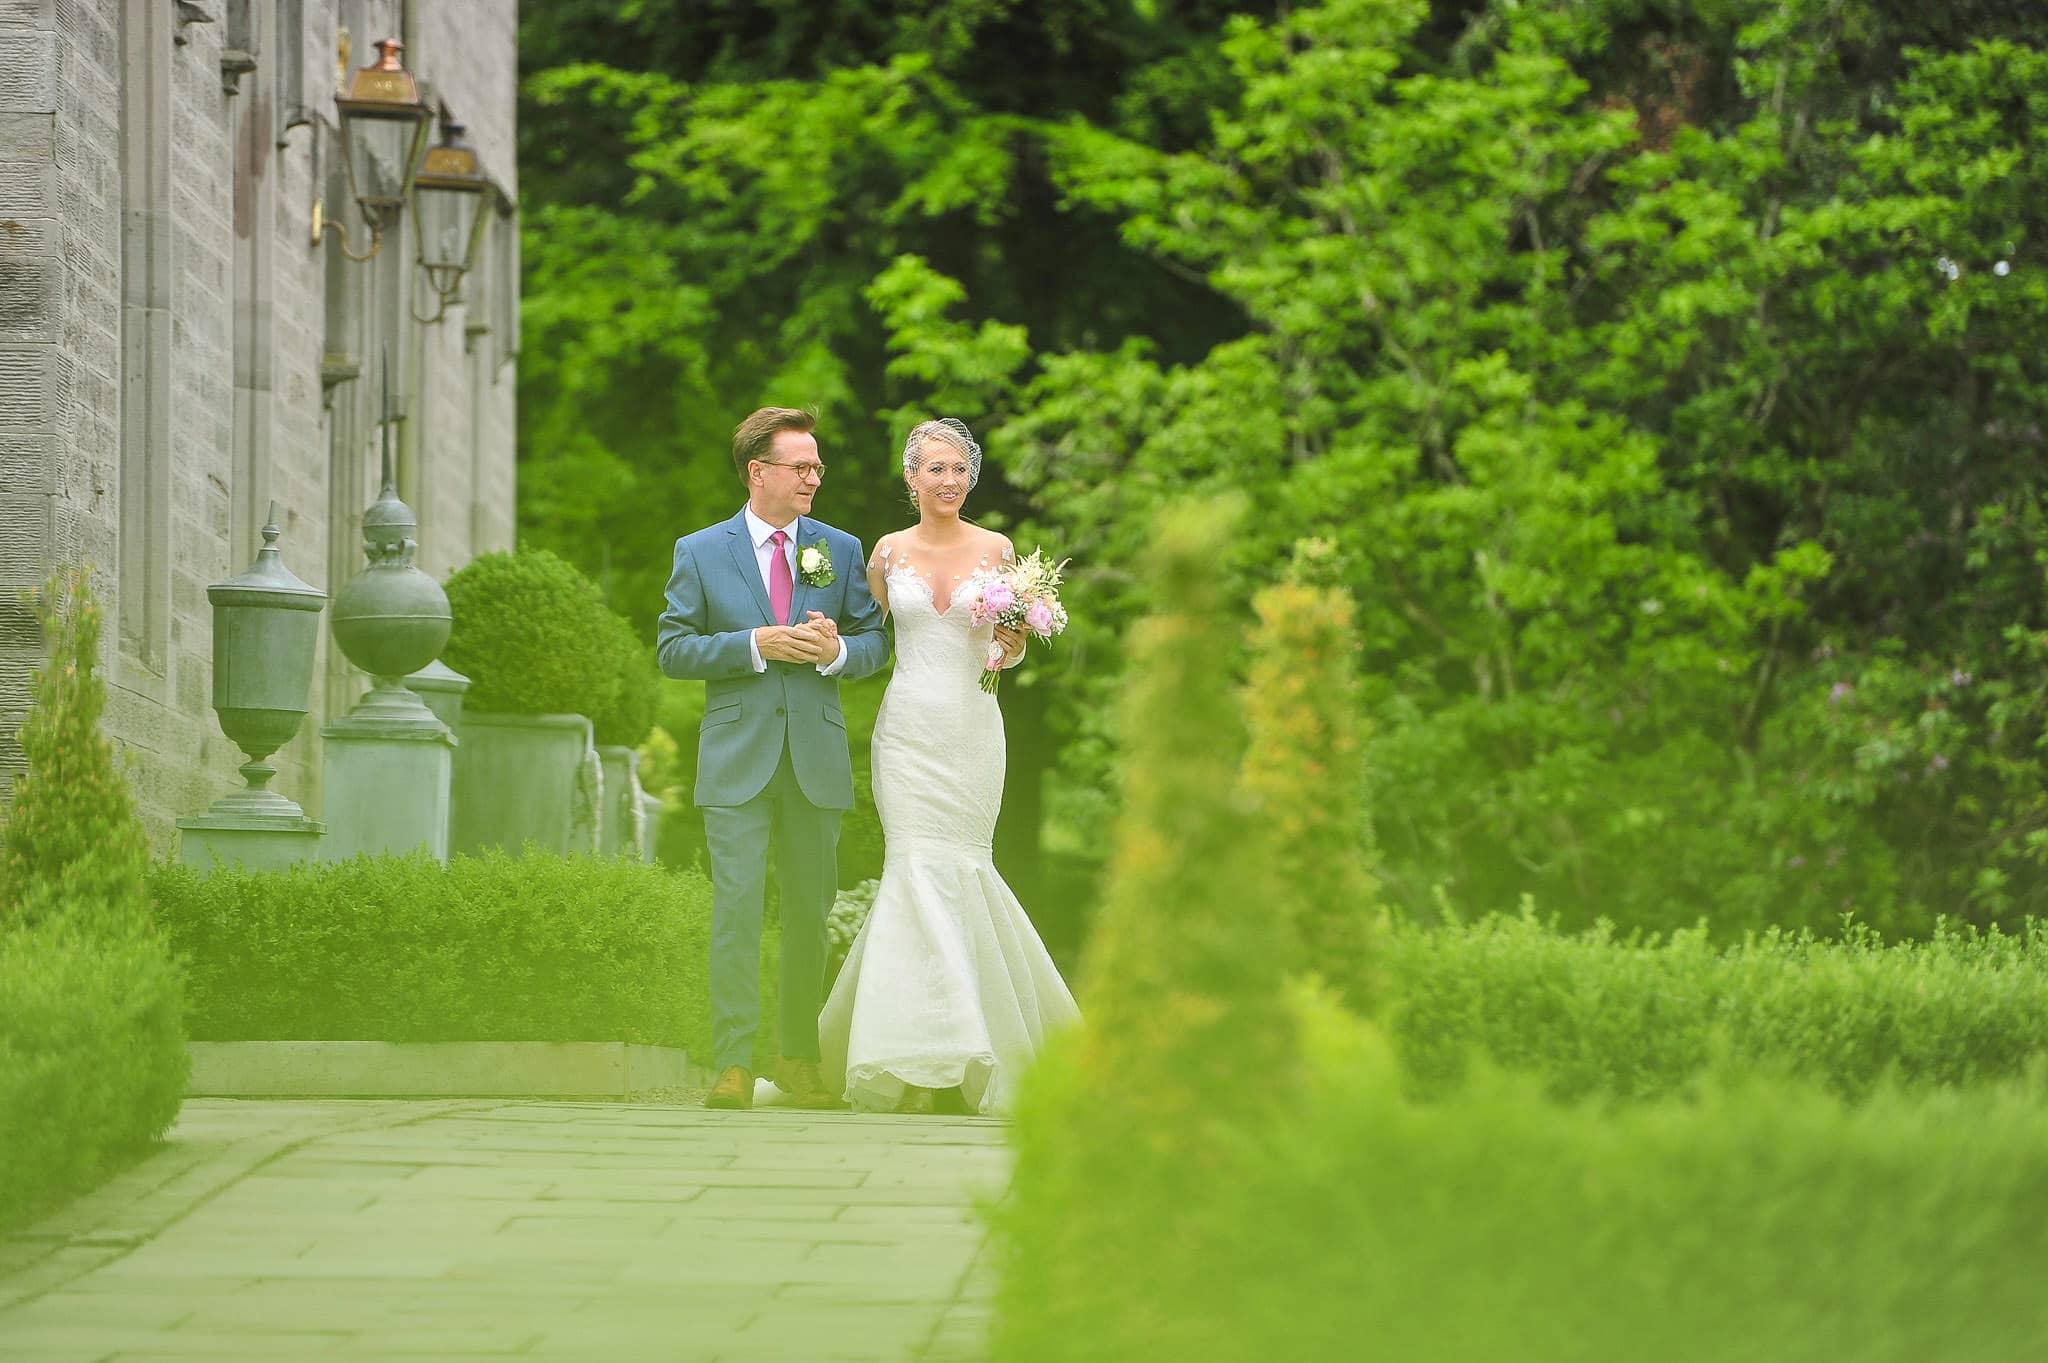 Lemore Manor Wedding Photographer | Hannah and Angus 18